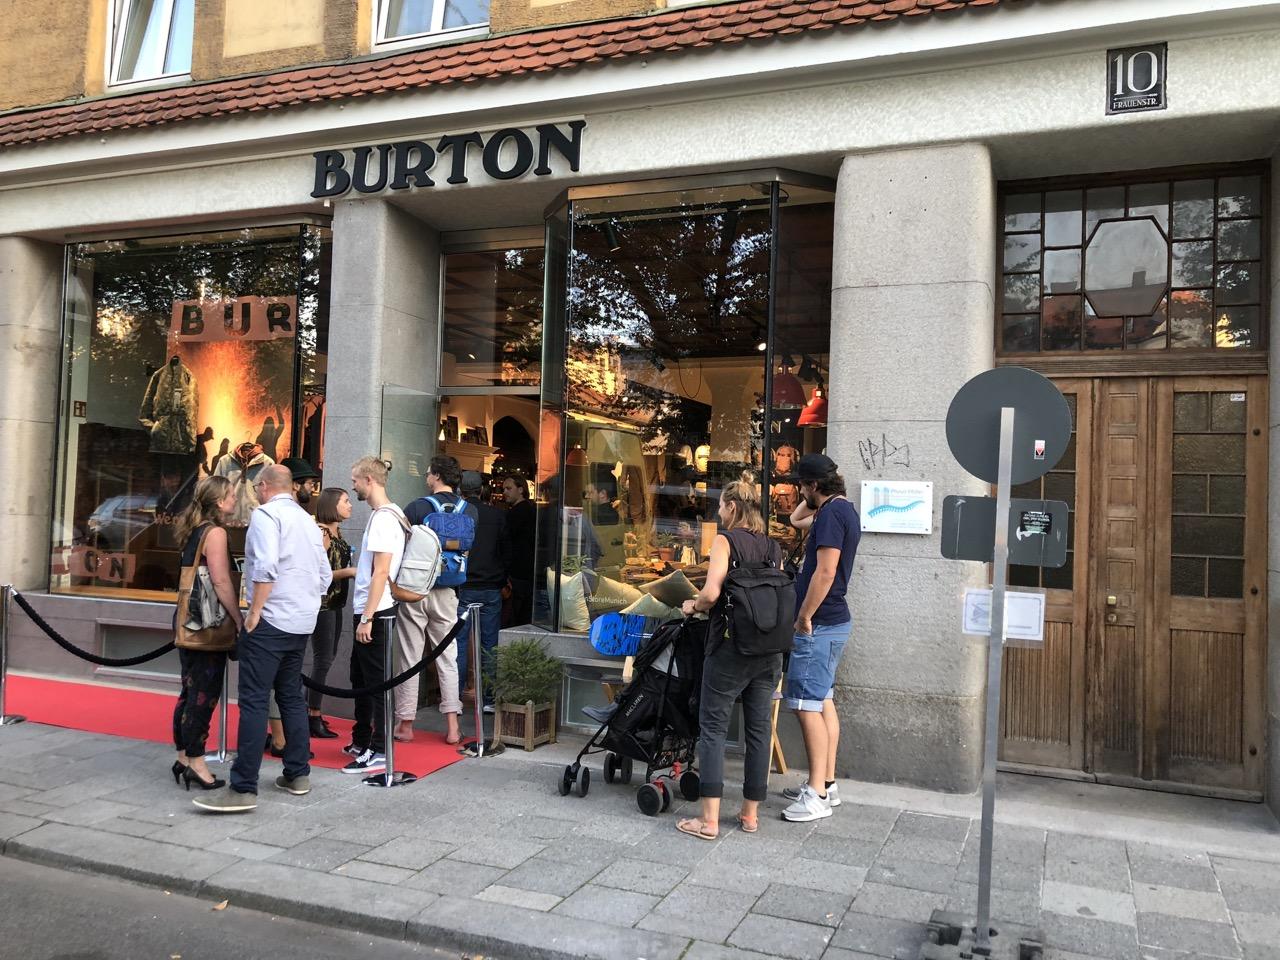 01 Red Carpet for Burton Shop Opening